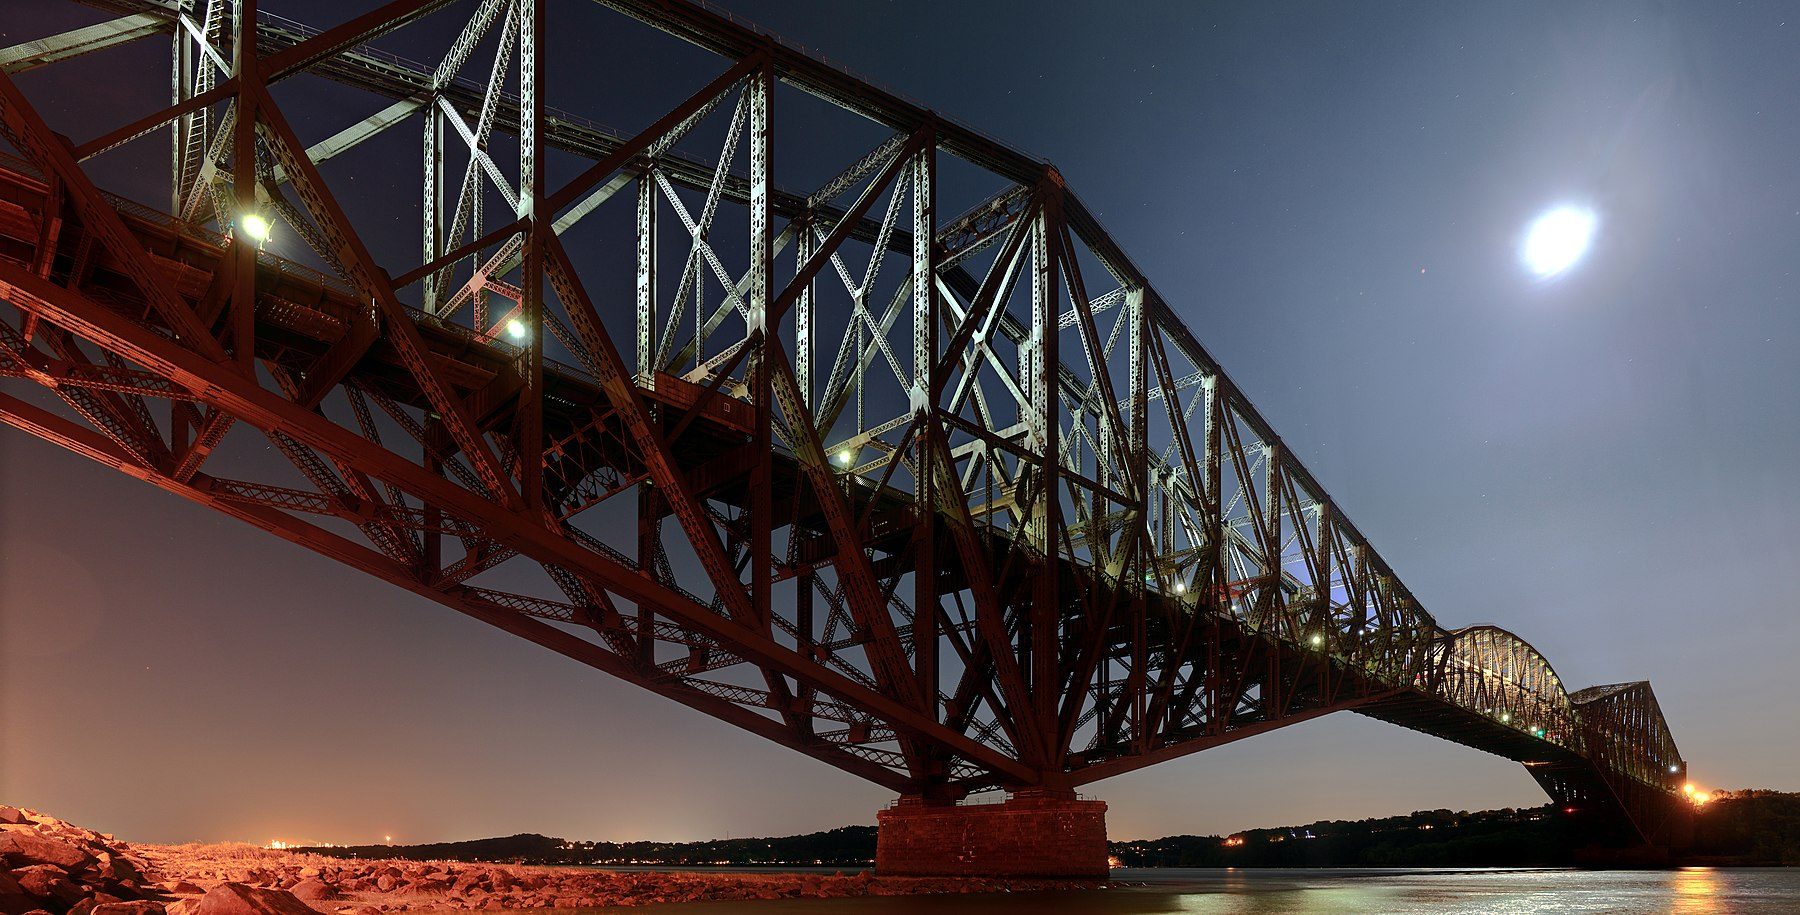 125 - Québec - Pont de Québec de nuit - Septembre 2009.jpg